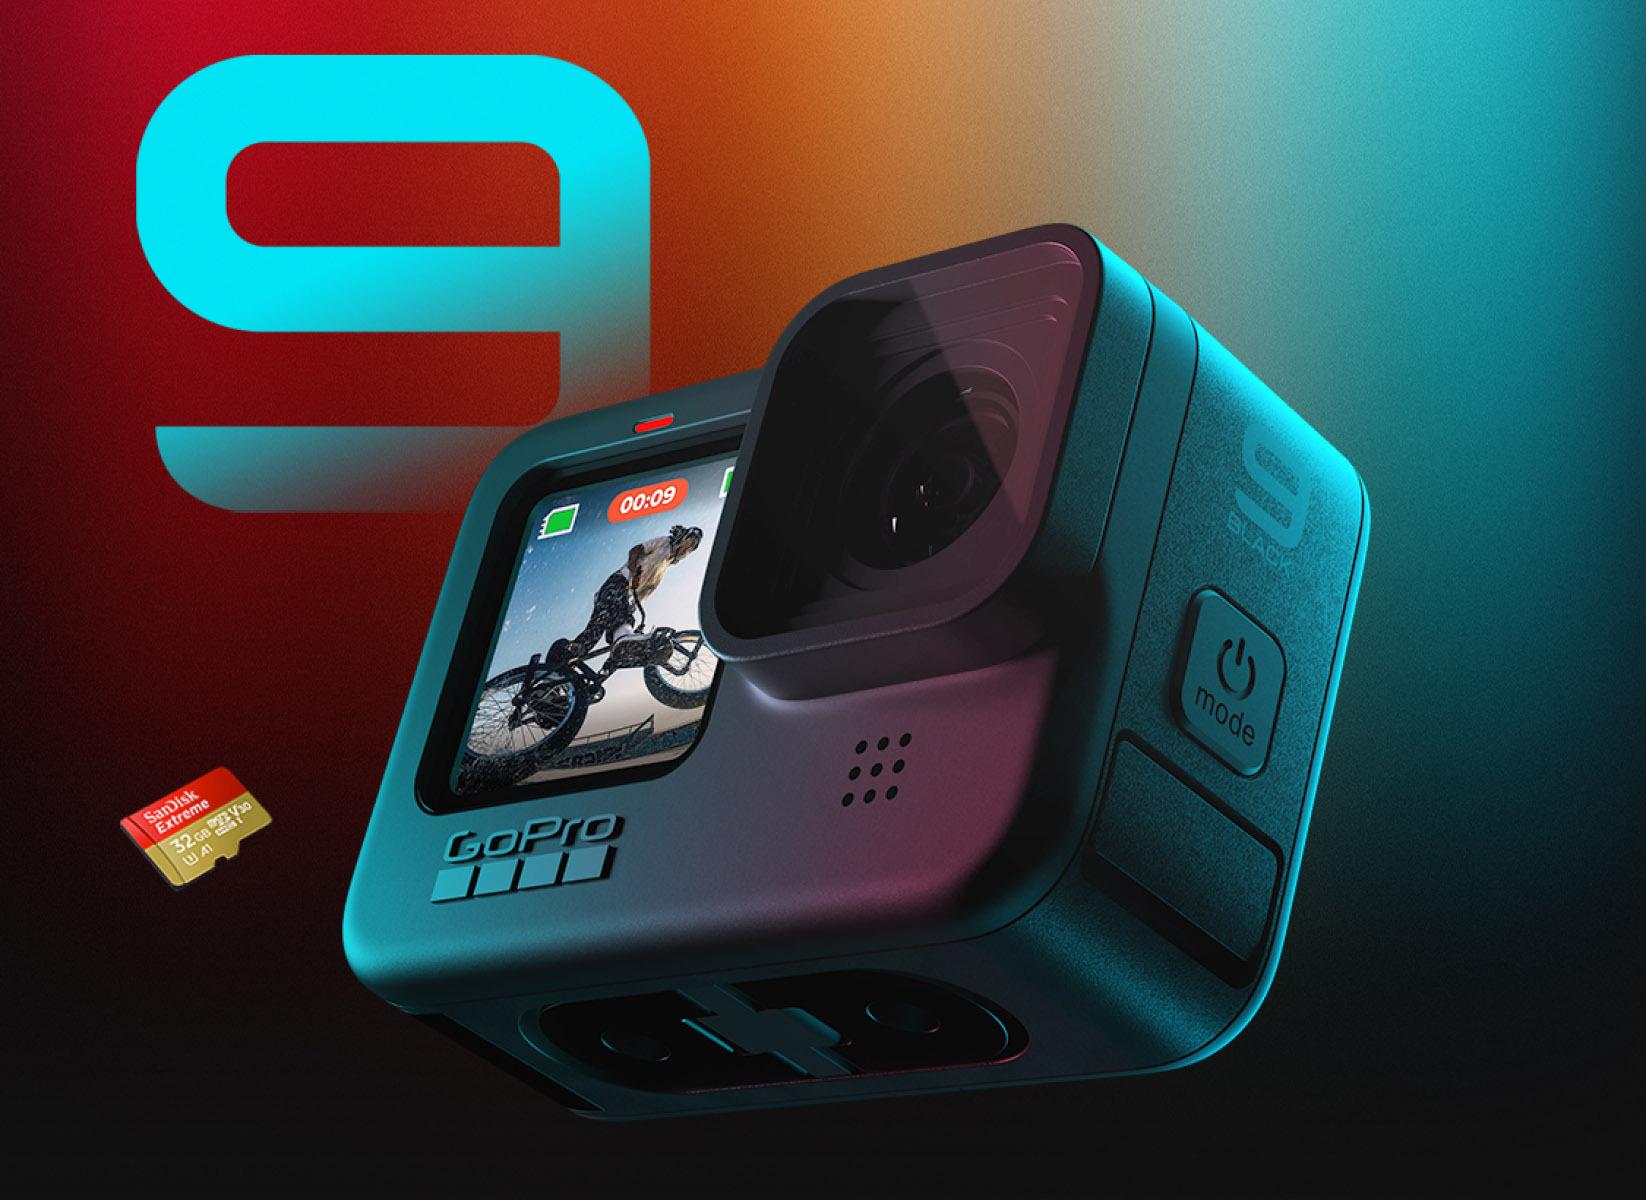 [HCM][Trả góp 0%] Máy quay Gopro Hero 9 Black Bản Bundle